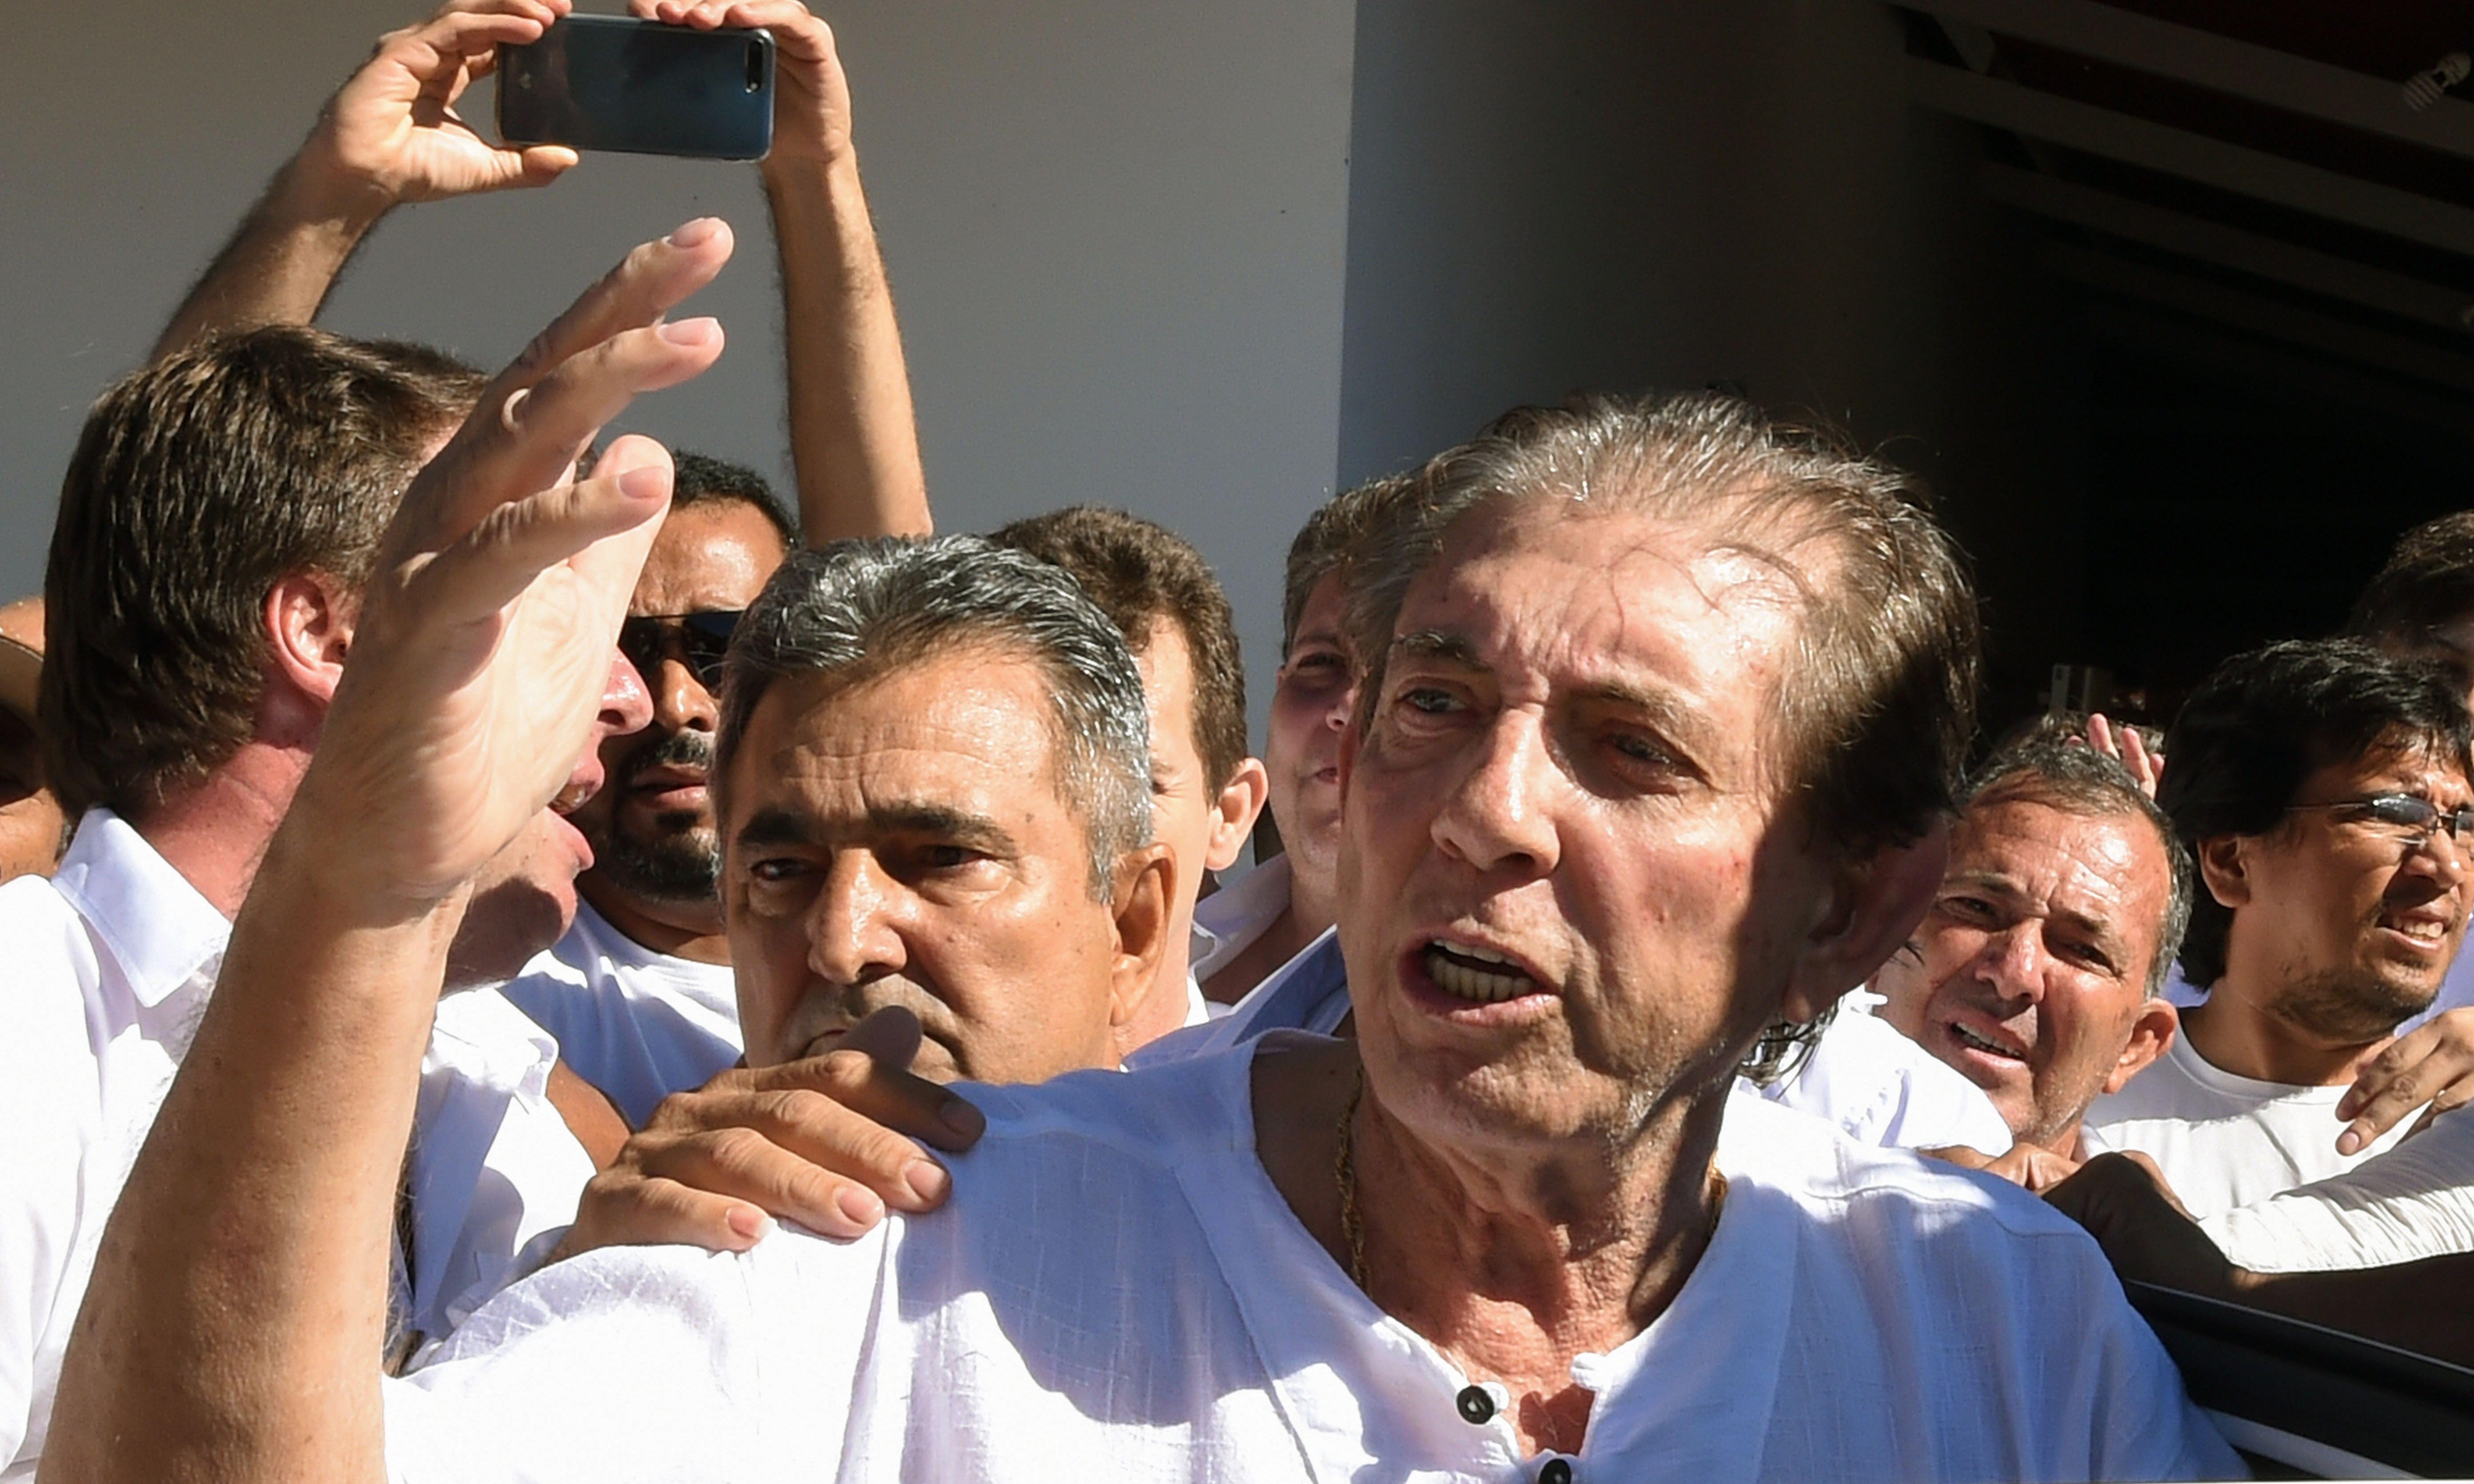 More than 200 women accuse famous Brazilian spiritual healer of sexual abuse